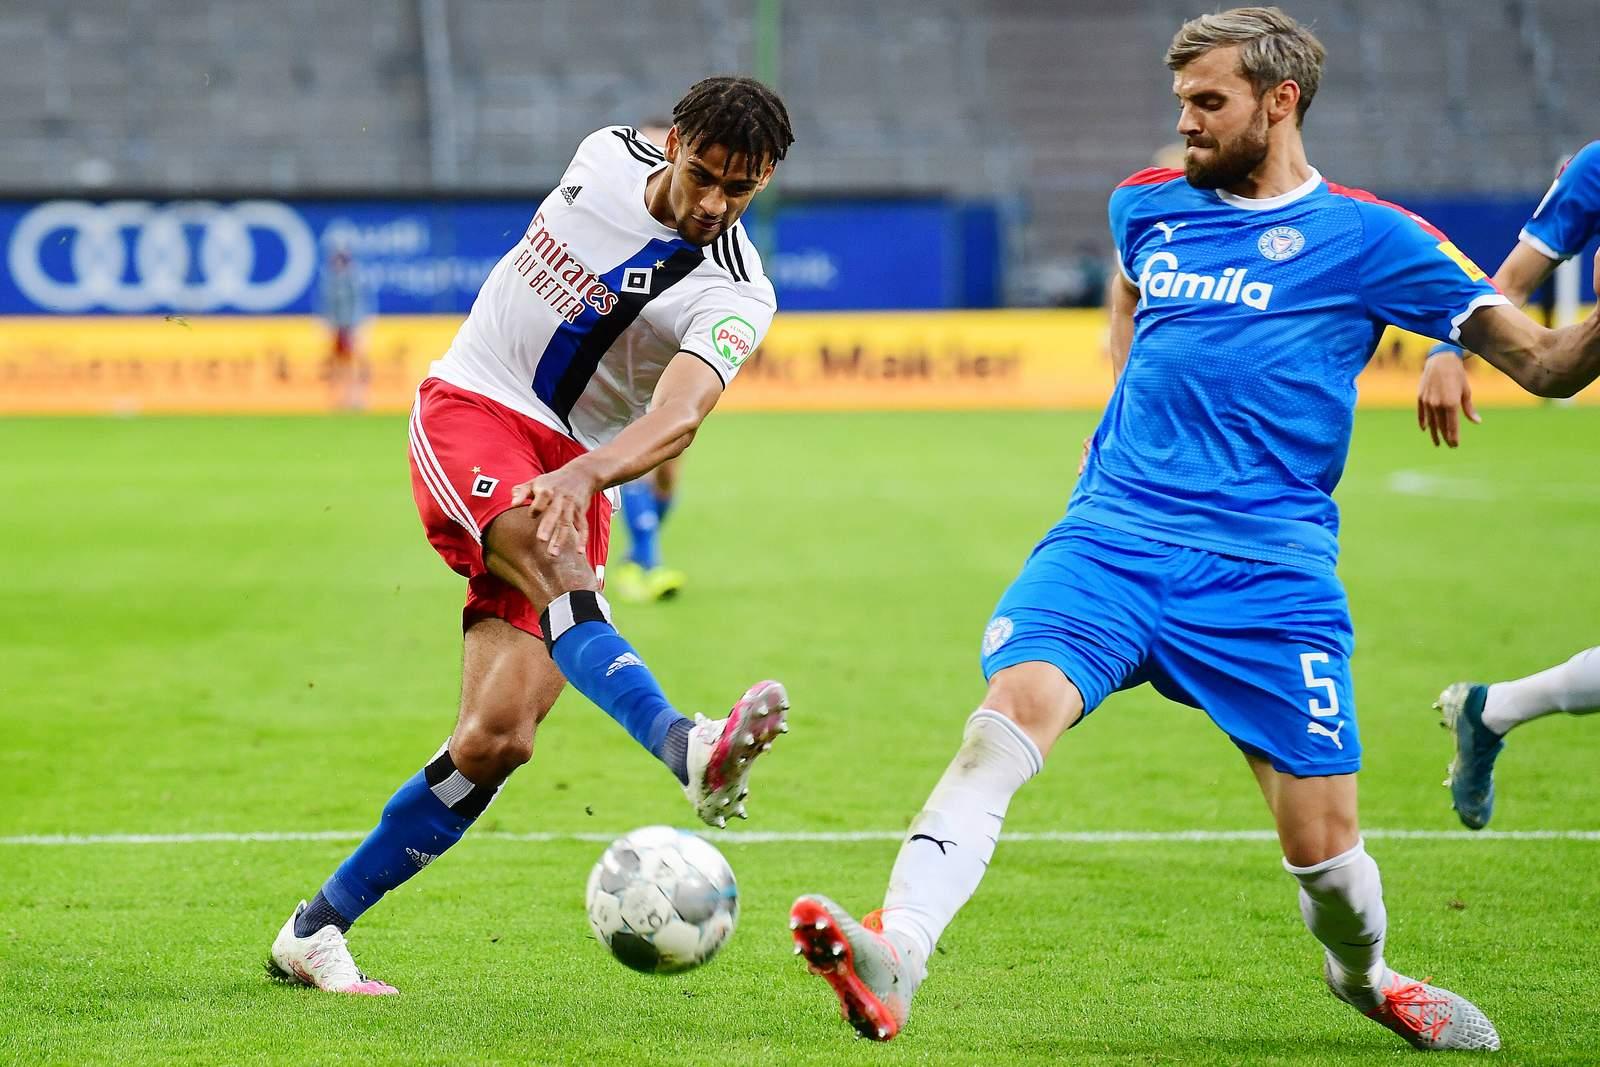 Josha Vagnoman gegen Stefan Thesker. Jetzt auf Kiel vs HSV wetten